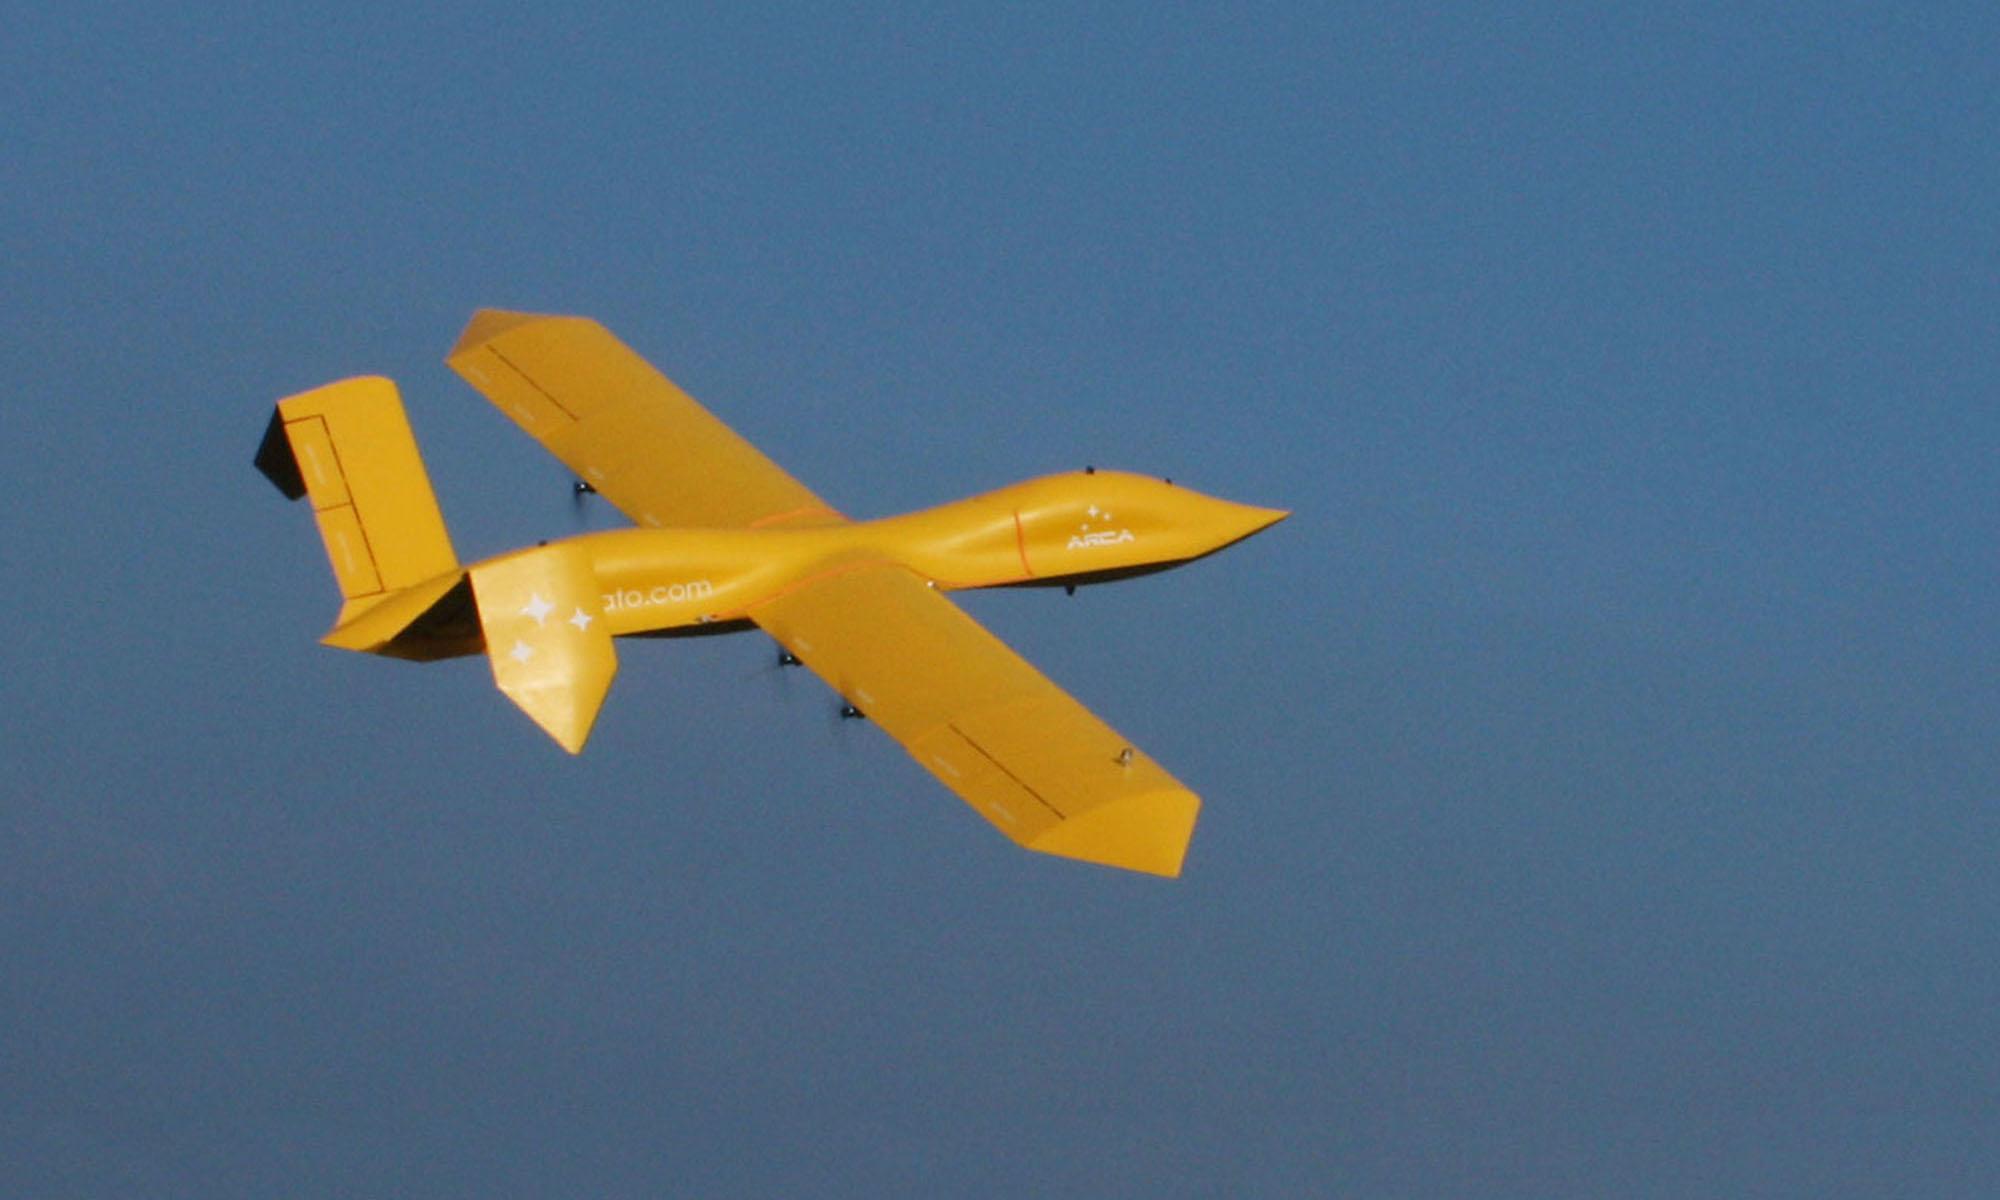 Arca's AirStrato Pioneer UAV